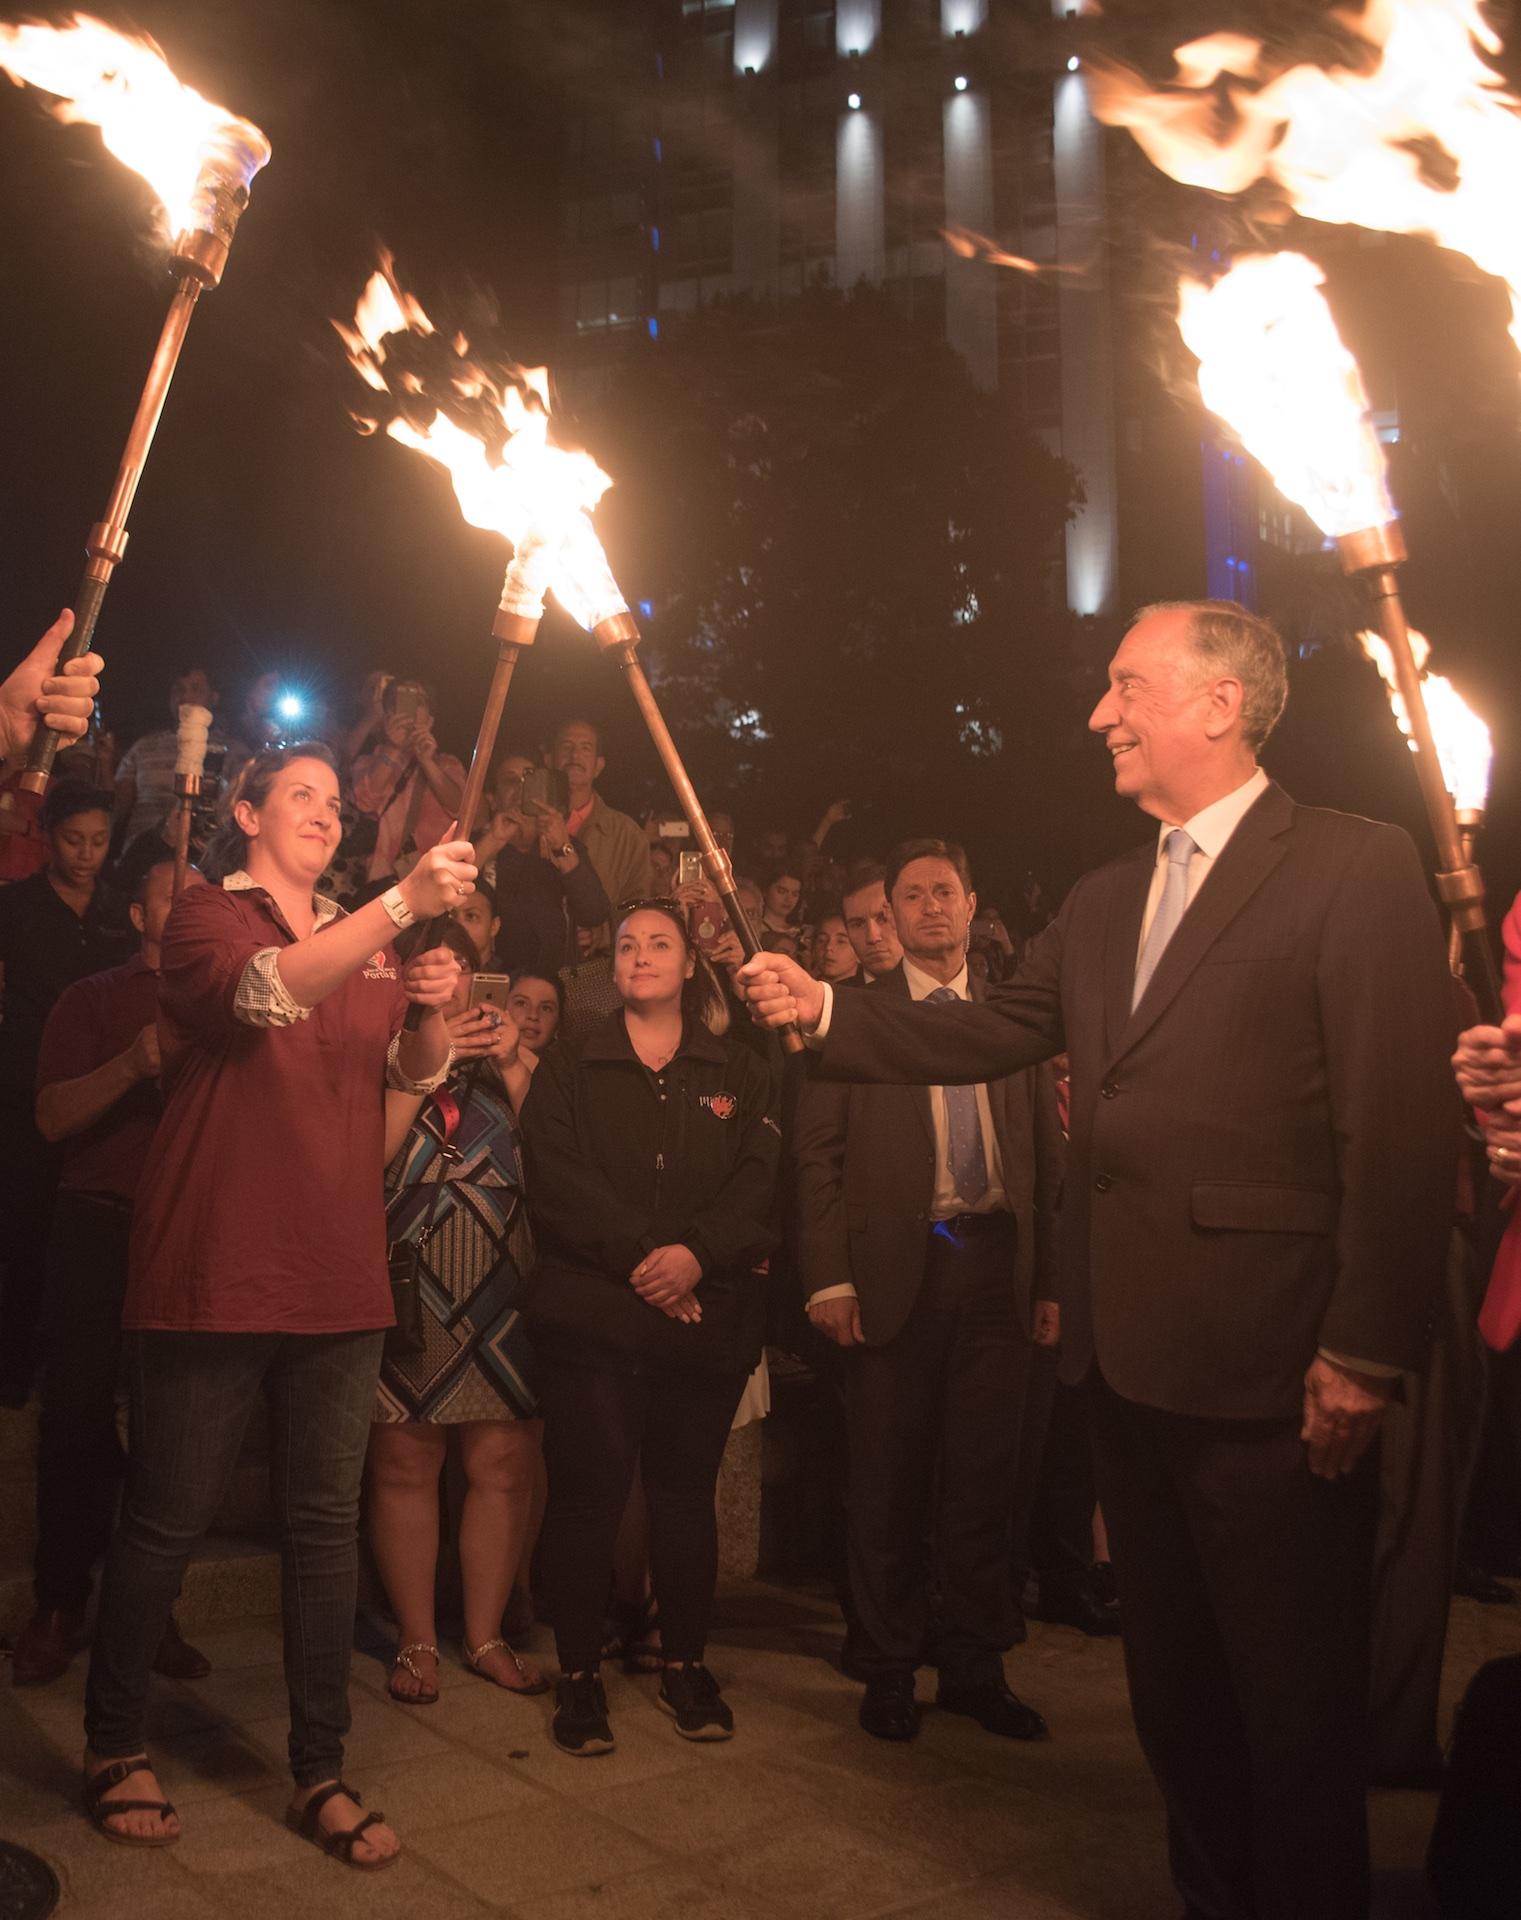 portuguese-president-marcelo-rebelo-de-sousa-lights-the-torch-of-a-ri-day-of-portugal-representative